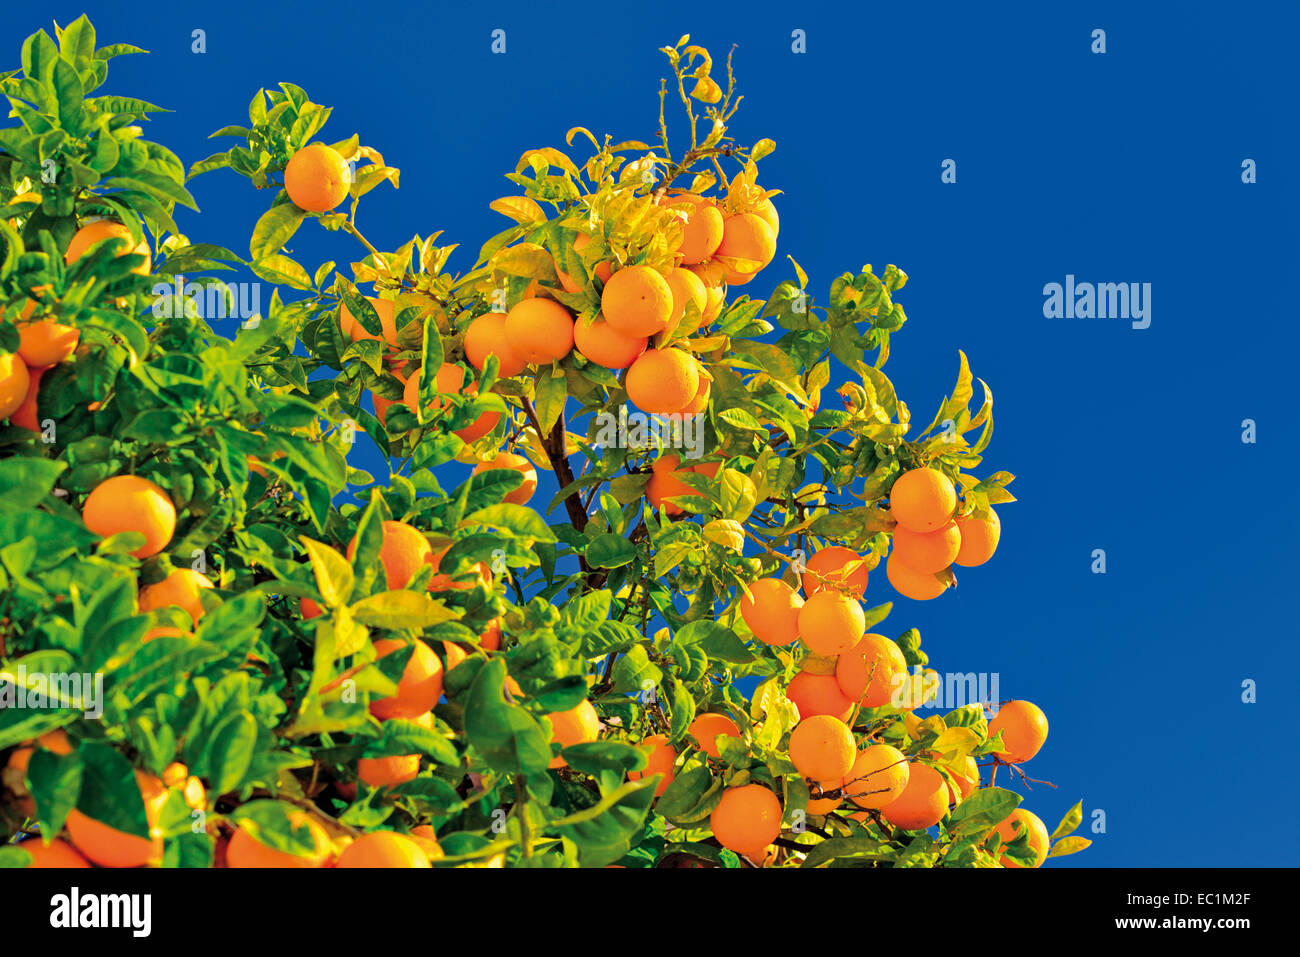 Portugal, Algarve: Orange tree with fruits (Citrus sinensis) in Faro Stock Photo